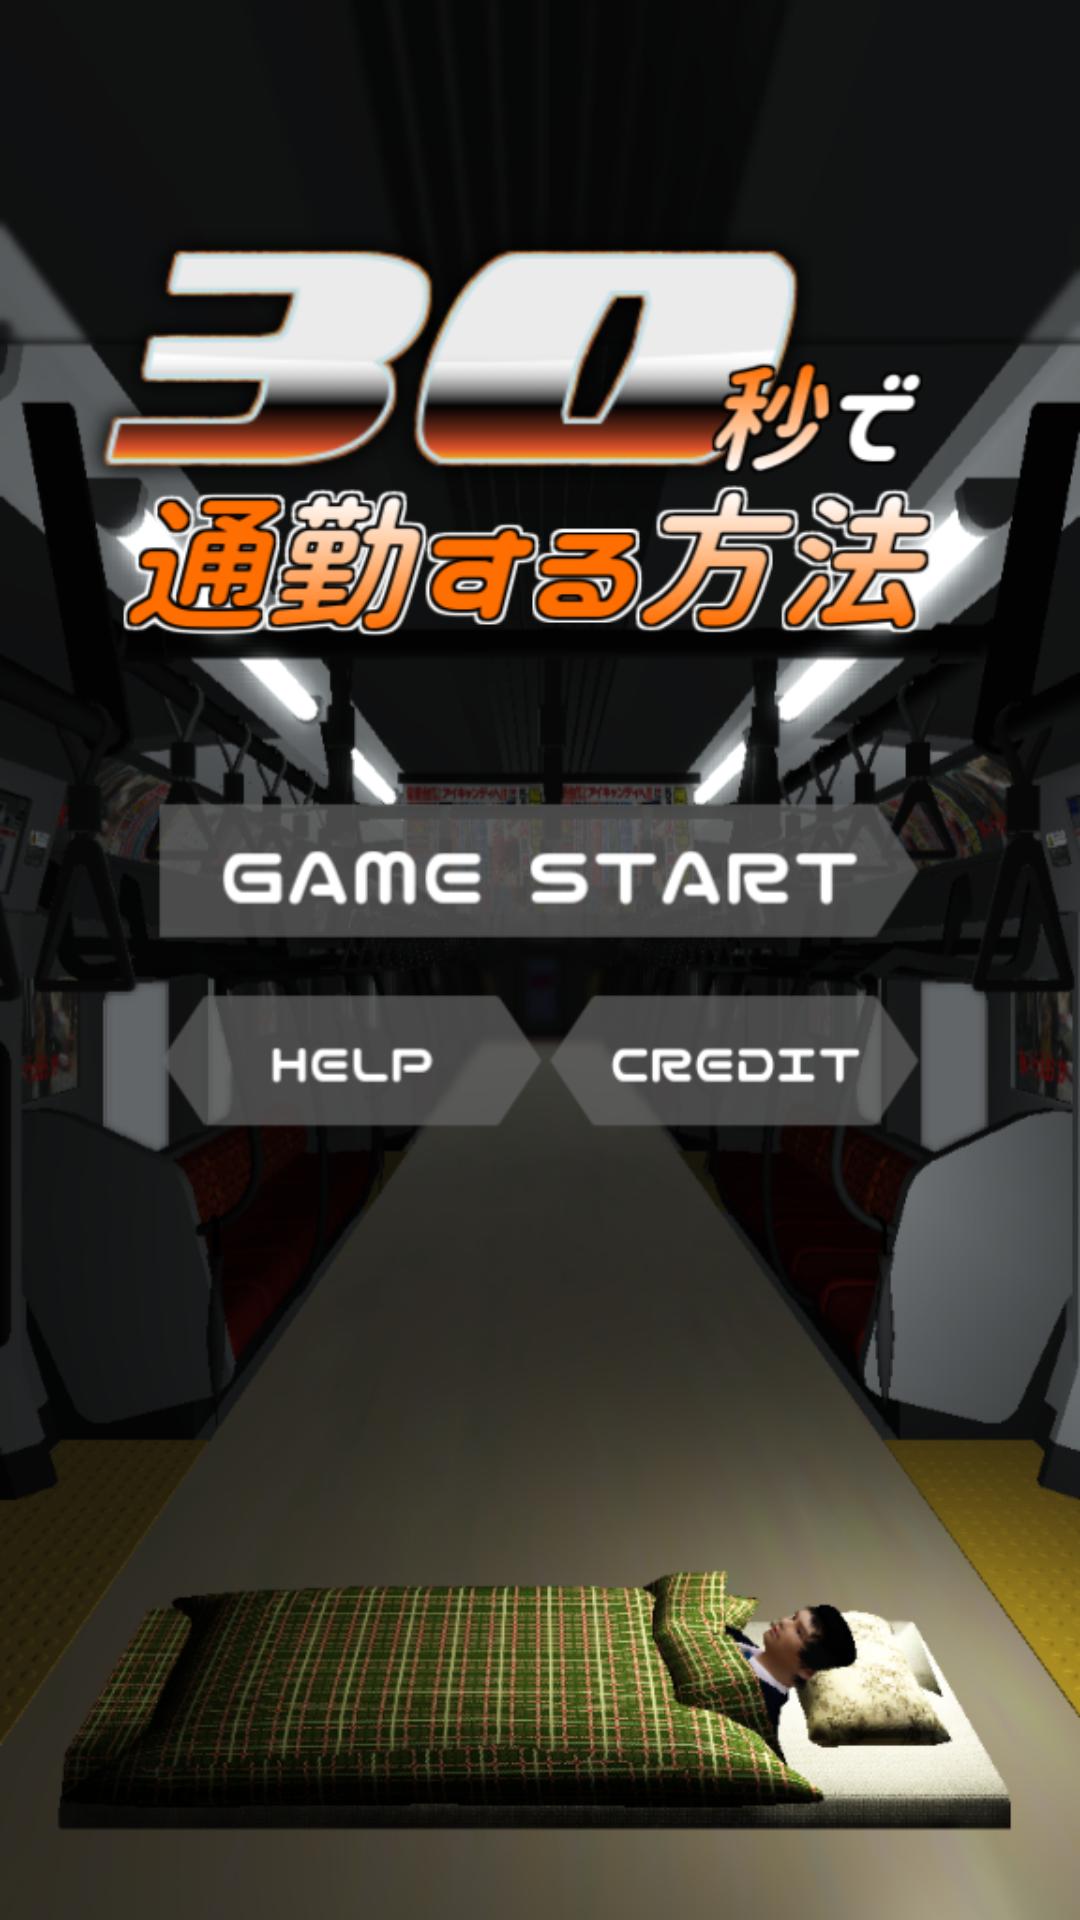 androidアプリ 30秒で通勤する方法〜八王子から東京駅まで〜攻略スクリーンショット1